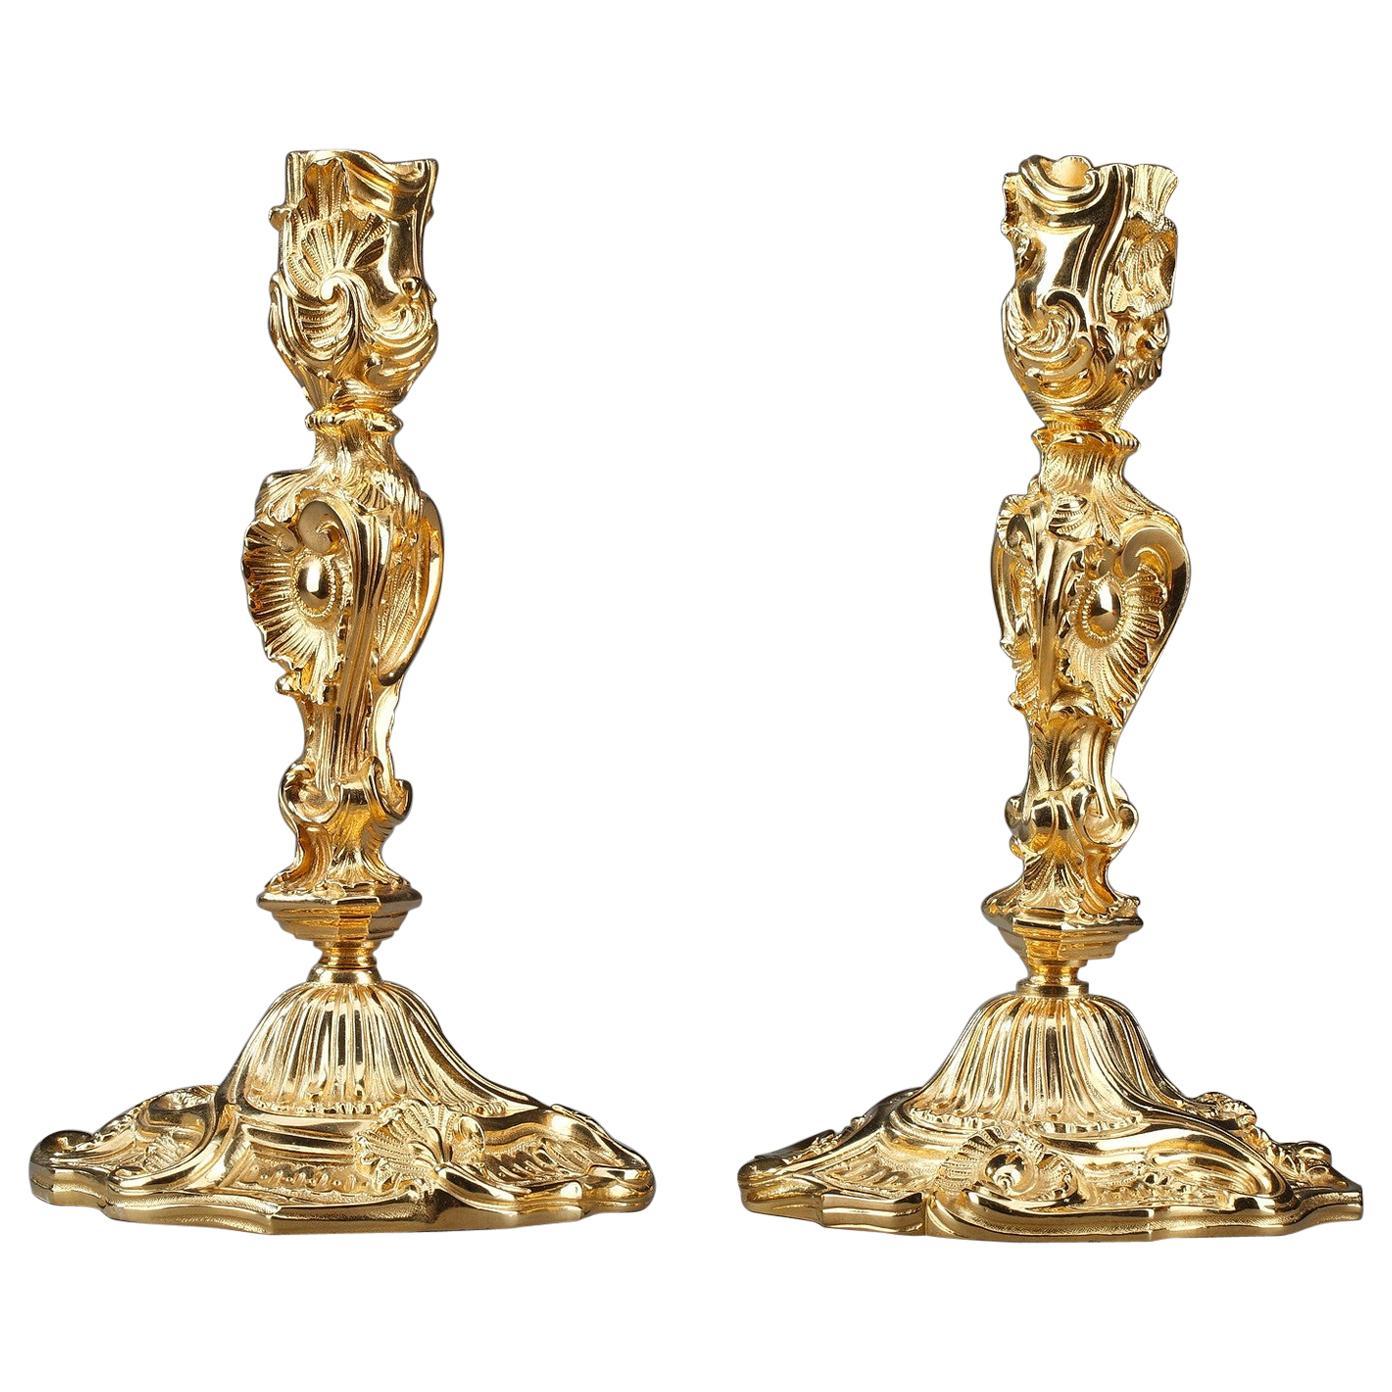 Louis XV Style Candlesticks in Gilt Bronze